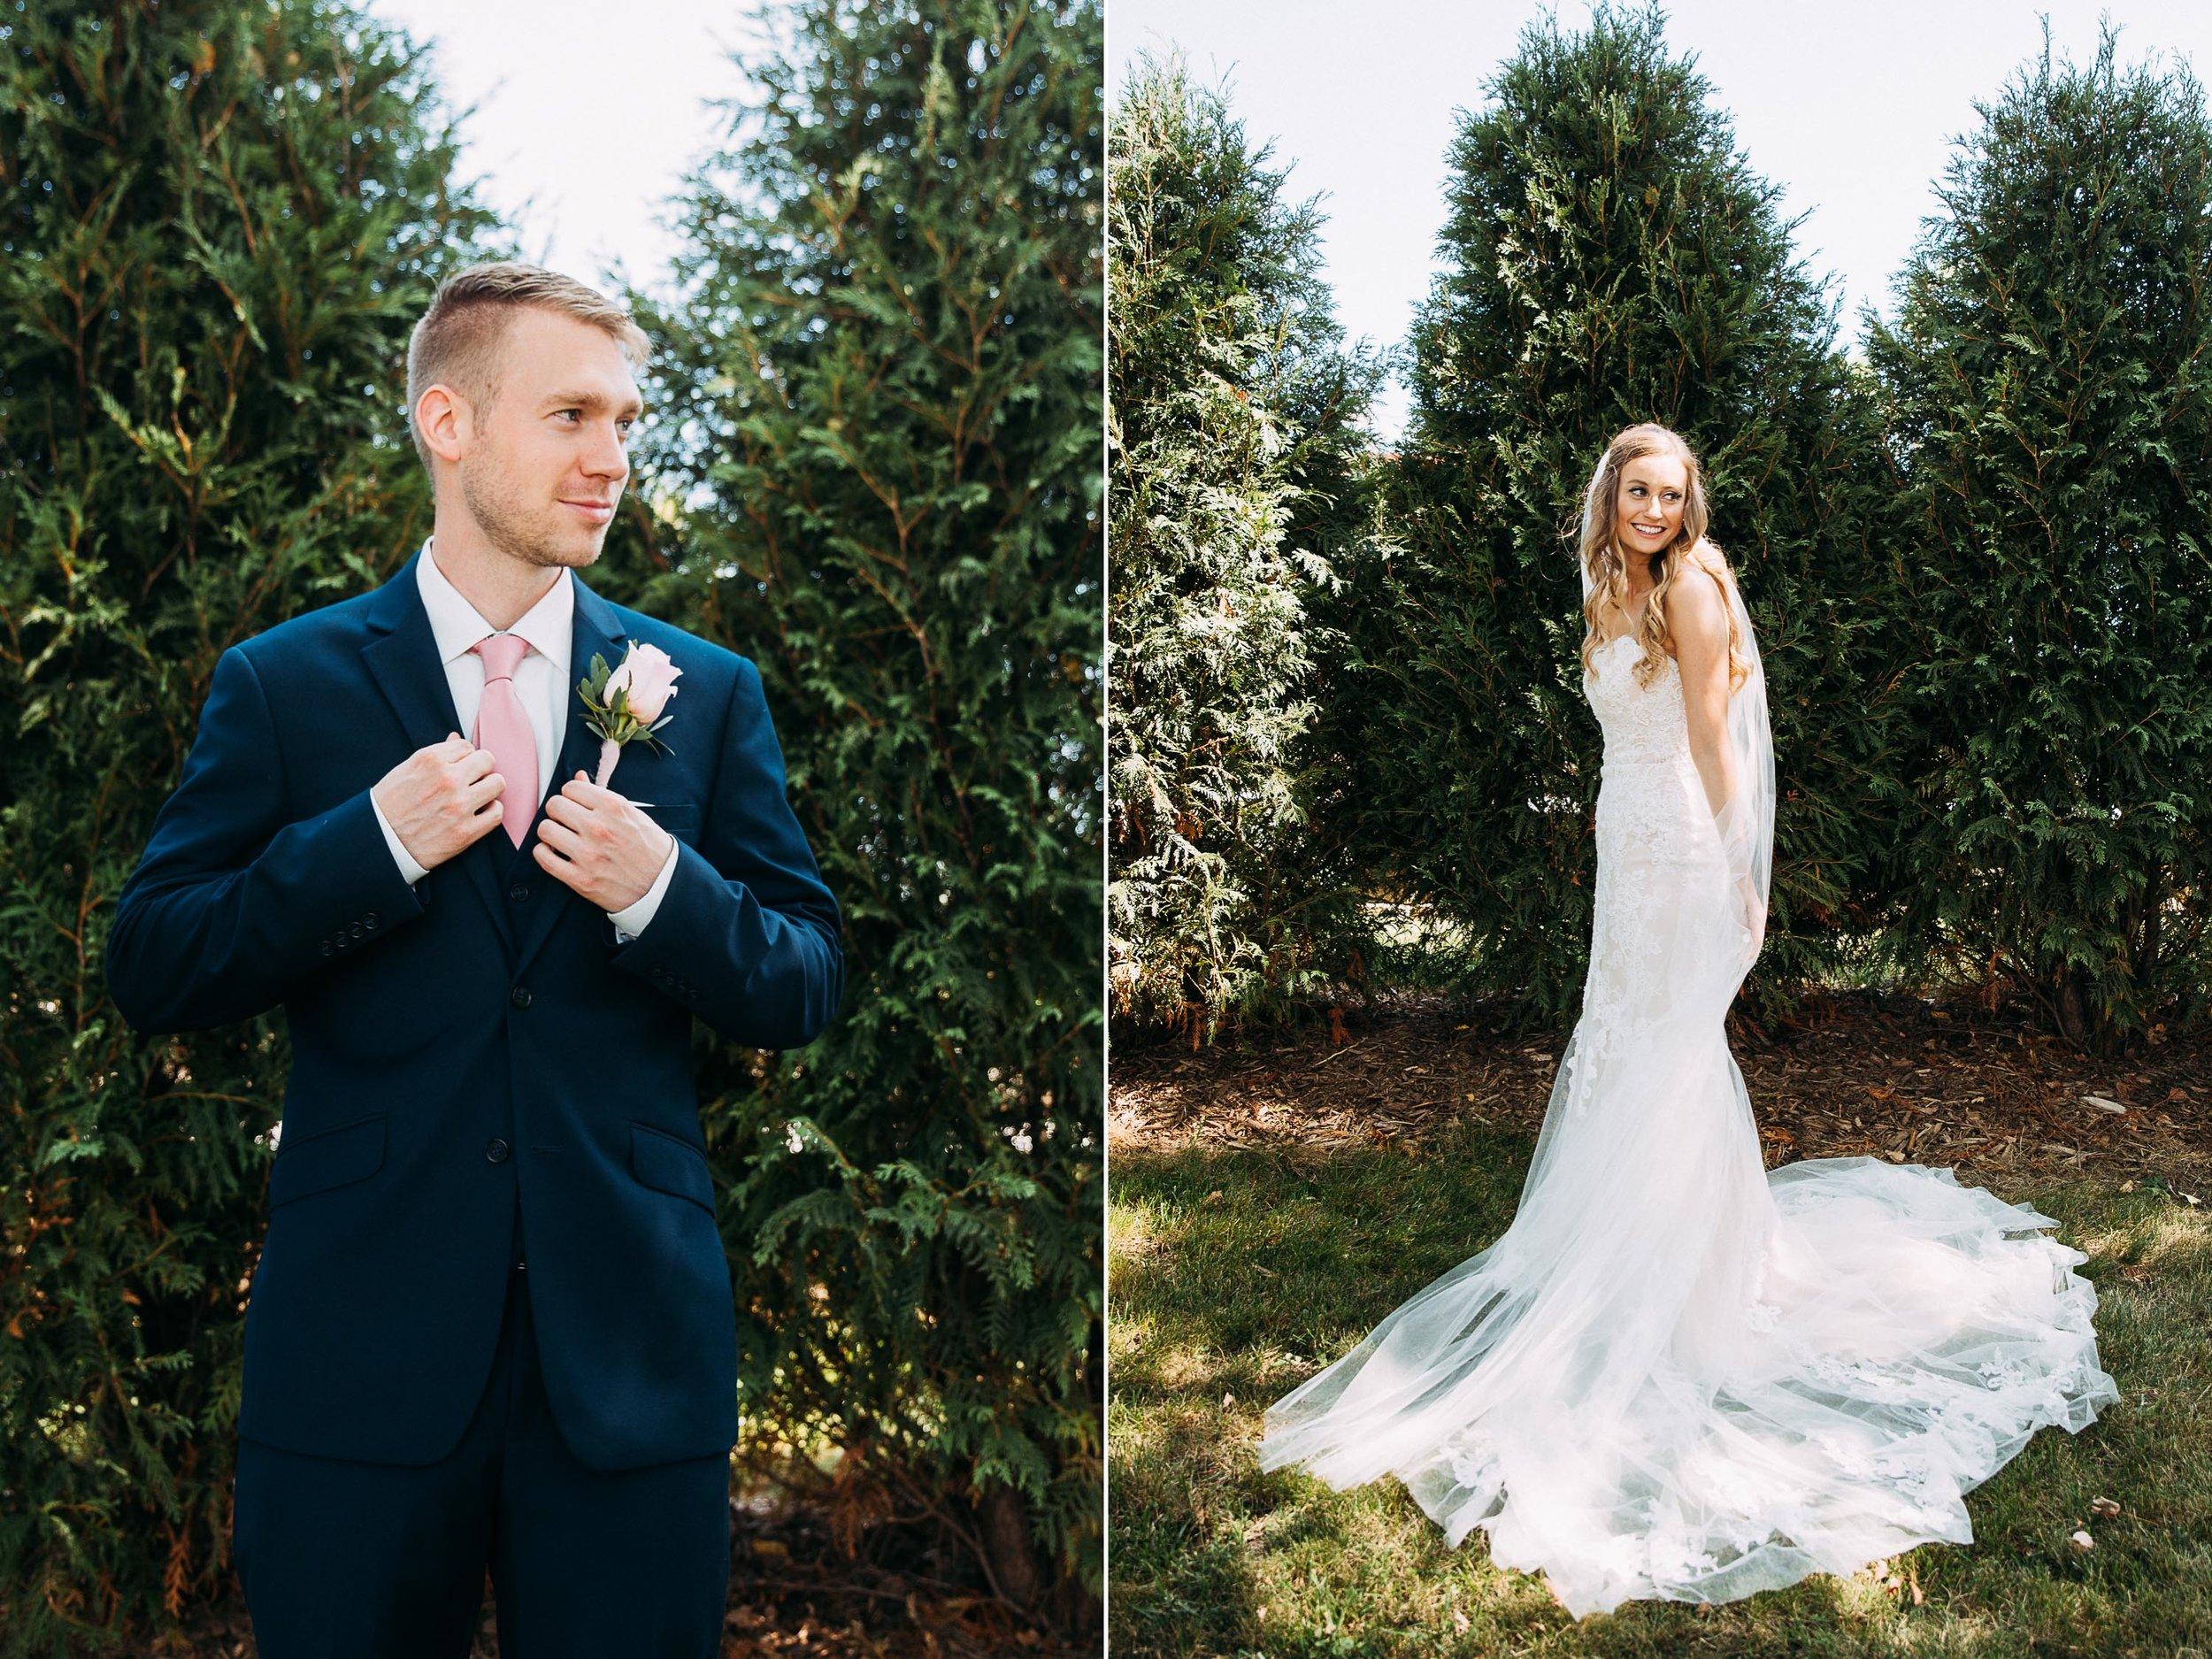 24-WeddingsattheBroz_Minnesota_WeddingBlog.jpg